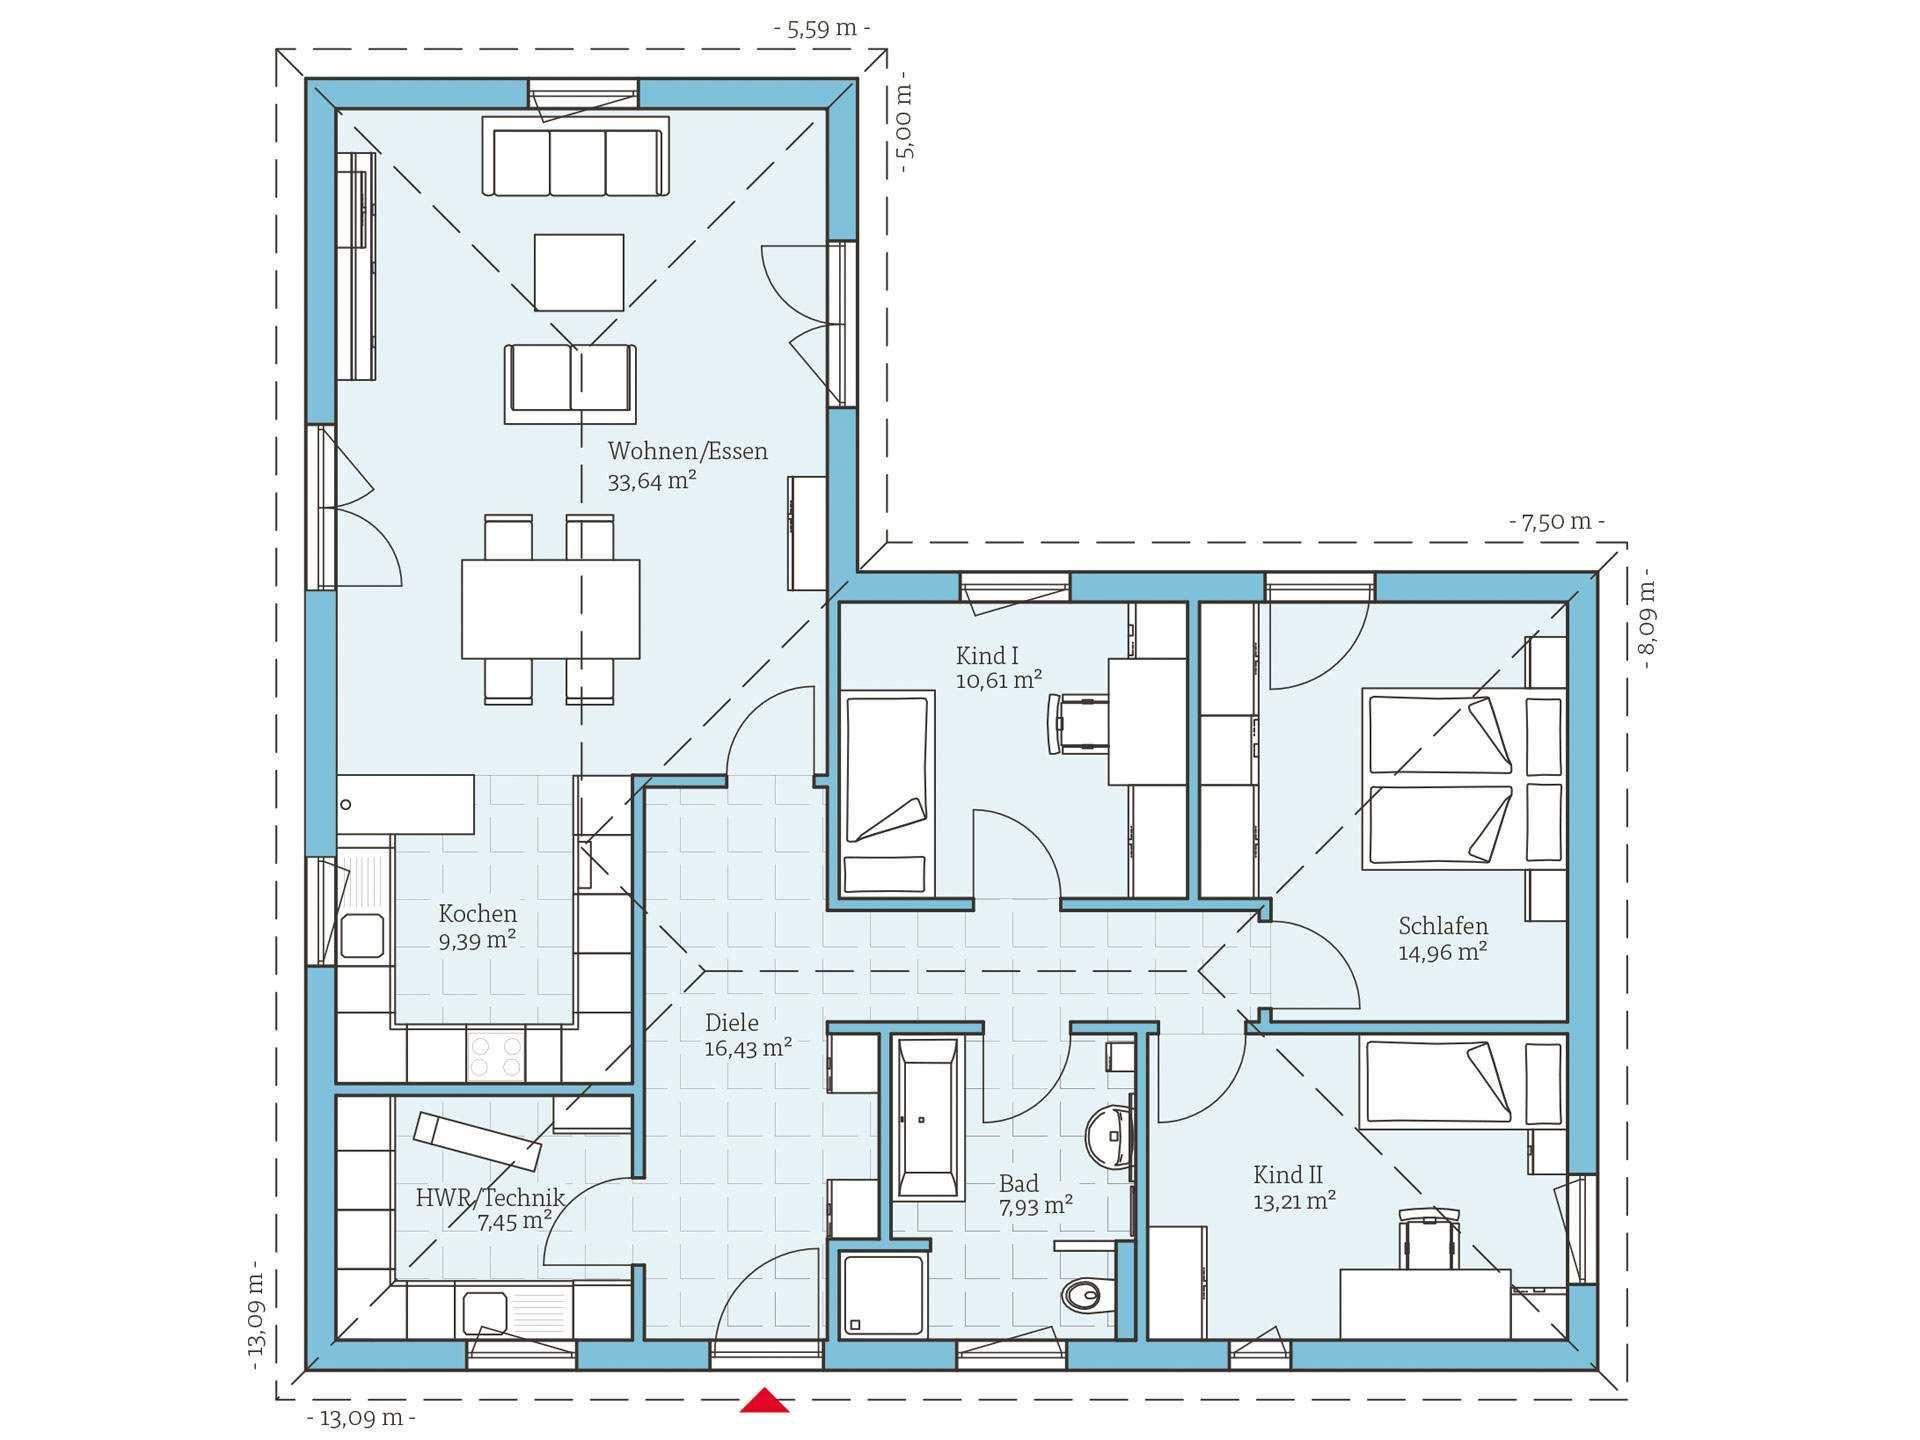 Bungalow grundriss lform Grundriss bungalow, Haus